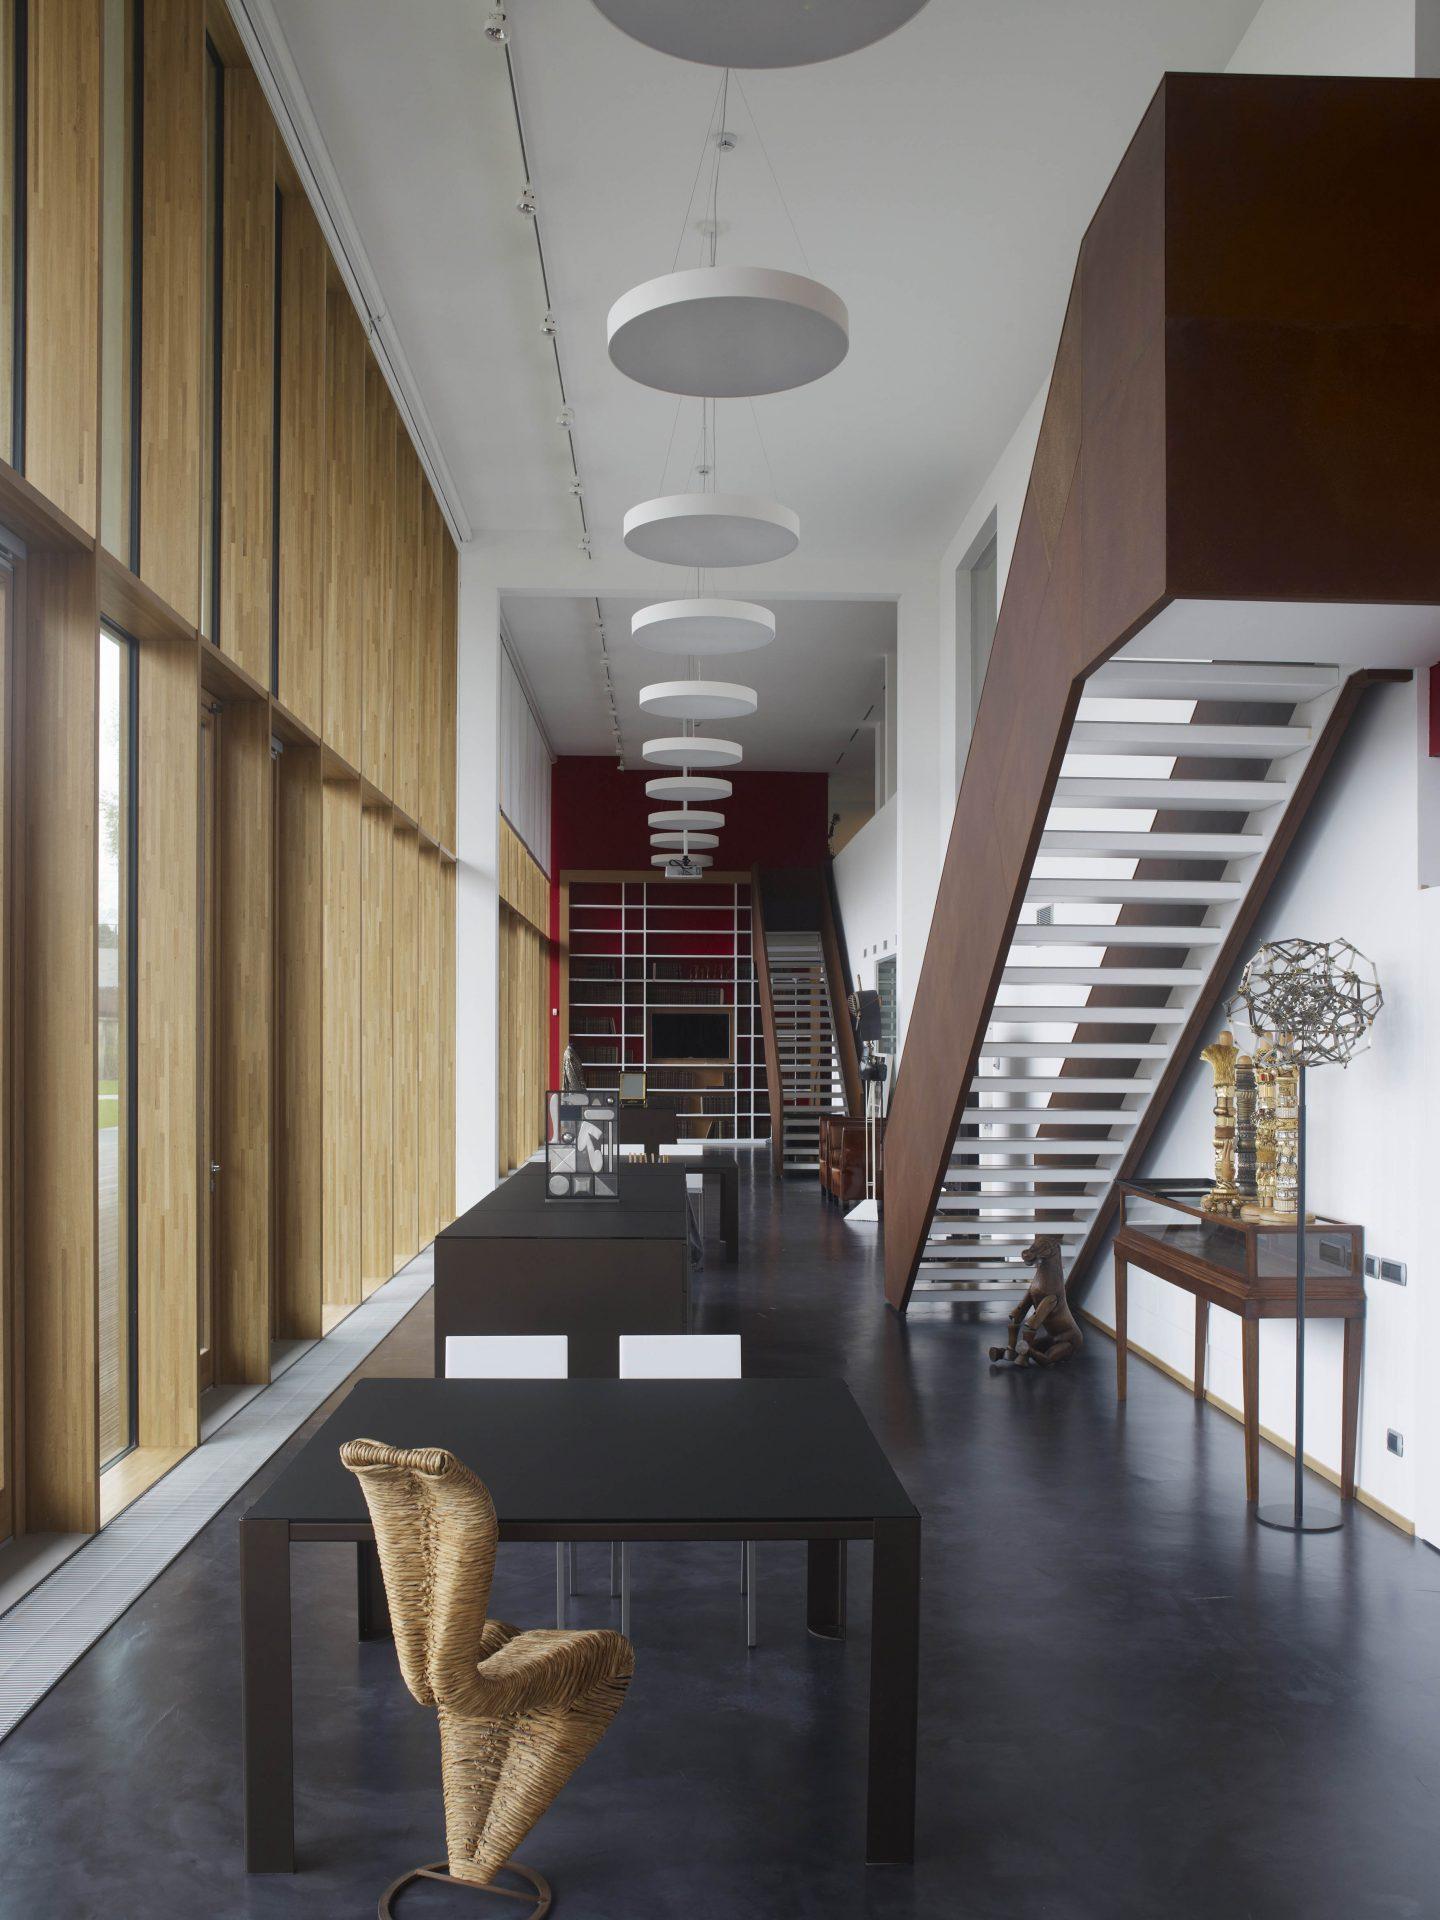 Fondazione Gianfranco Ferré Headquarters